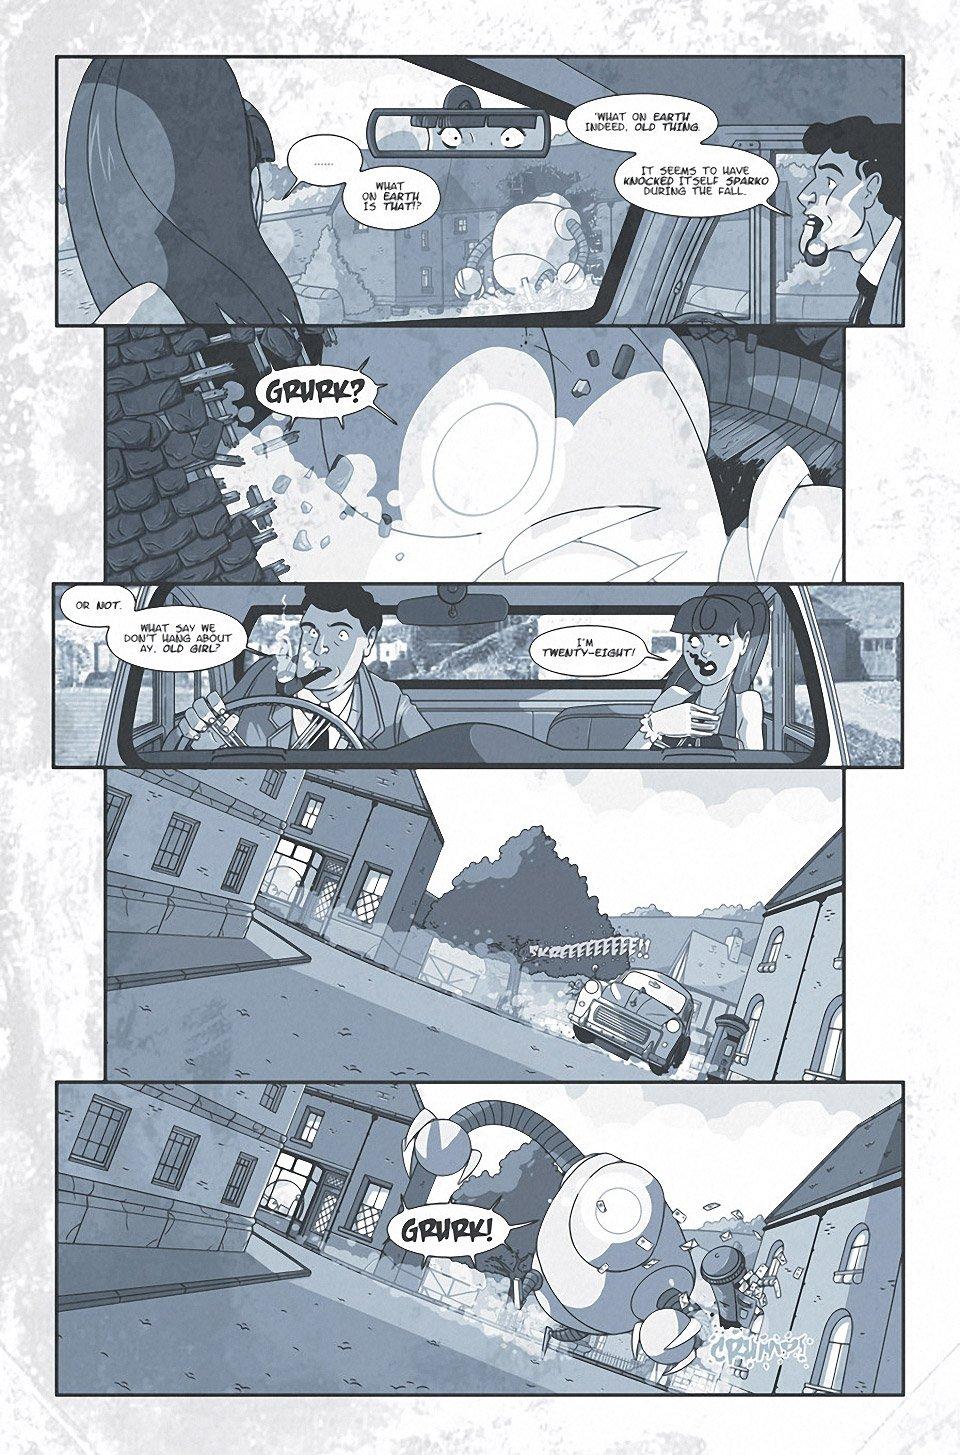 It Came! New Comic Series from Titan Comics